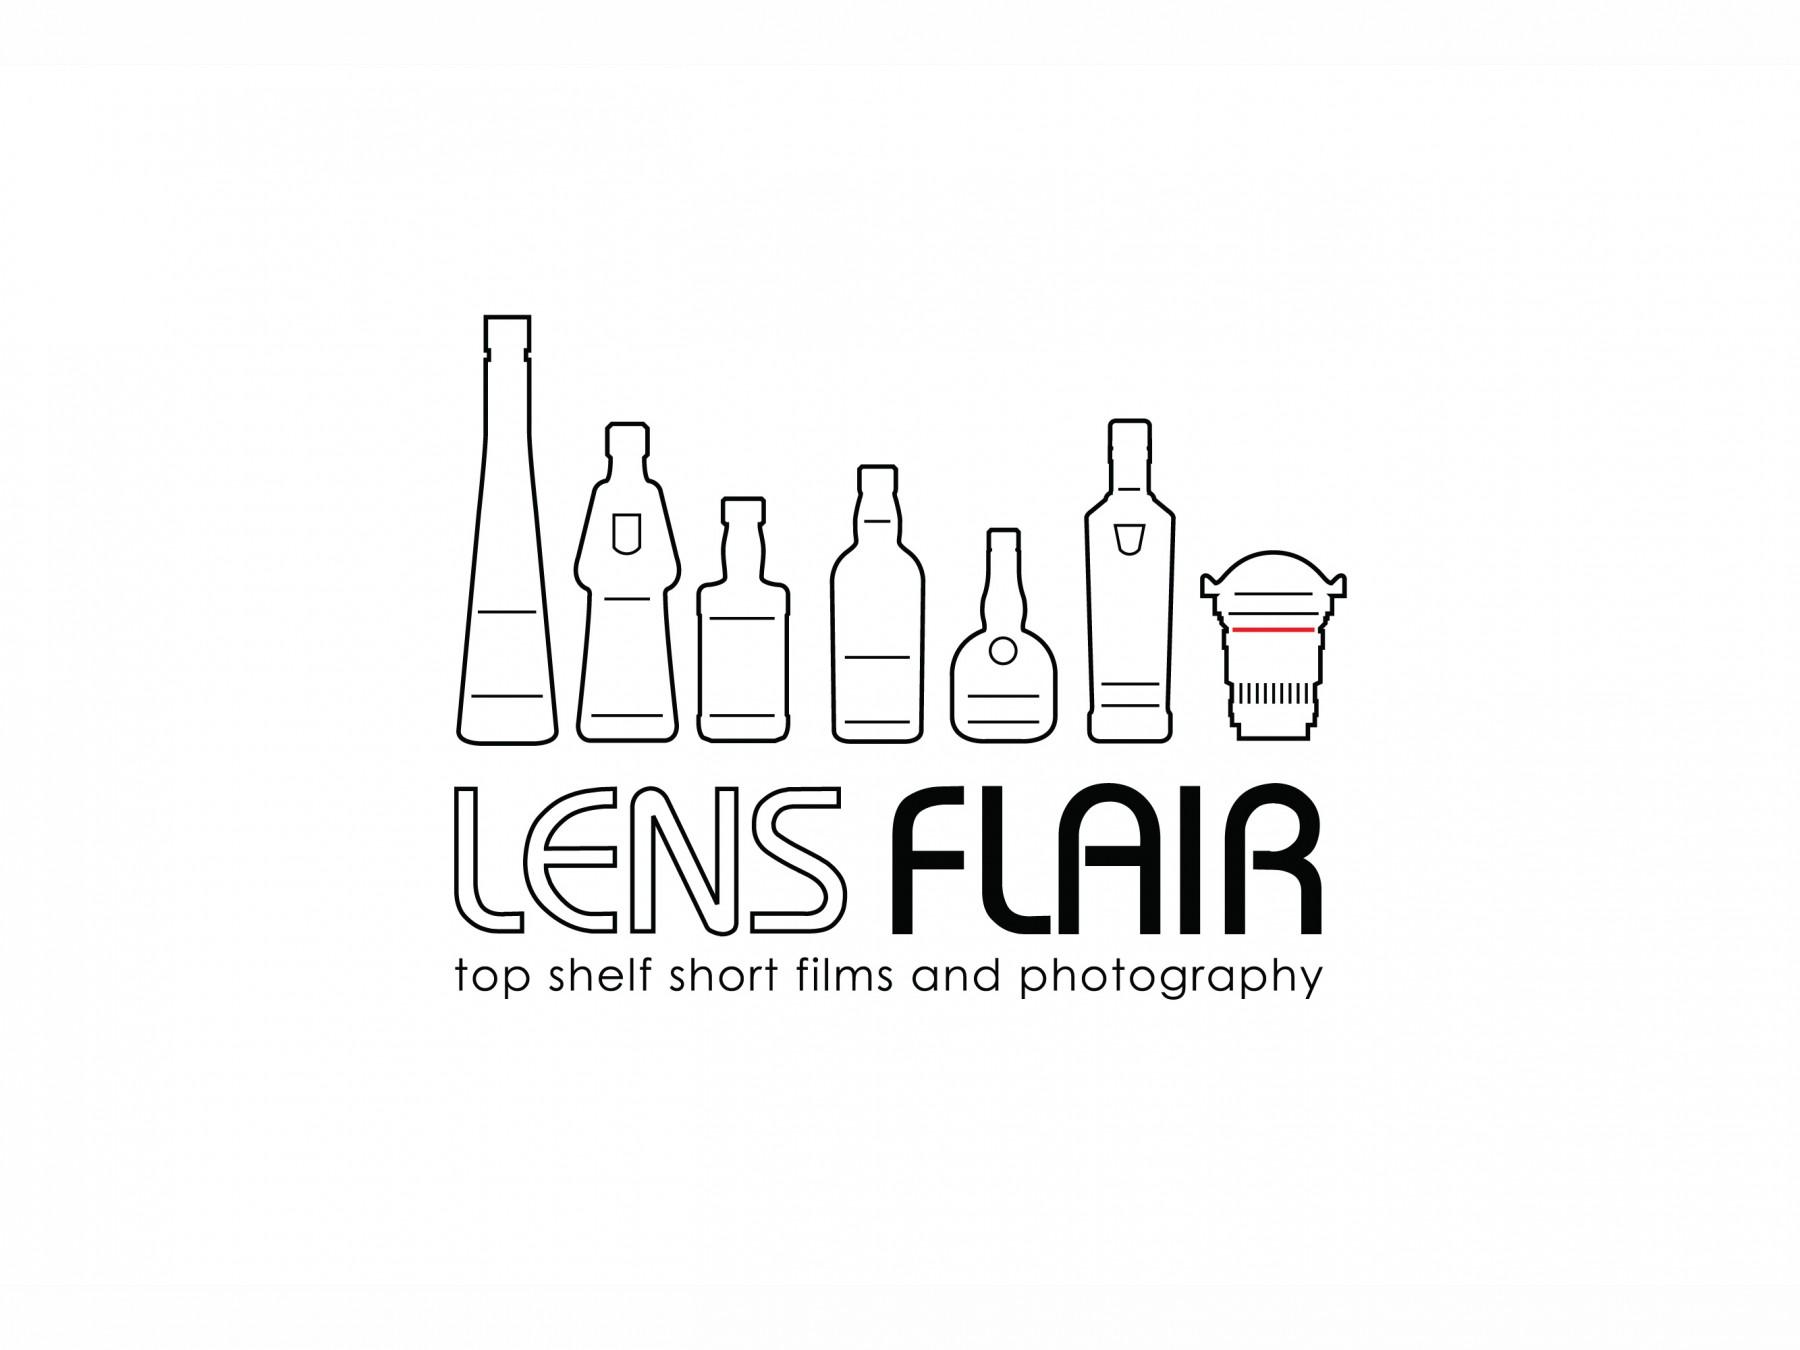 Lens-Flair